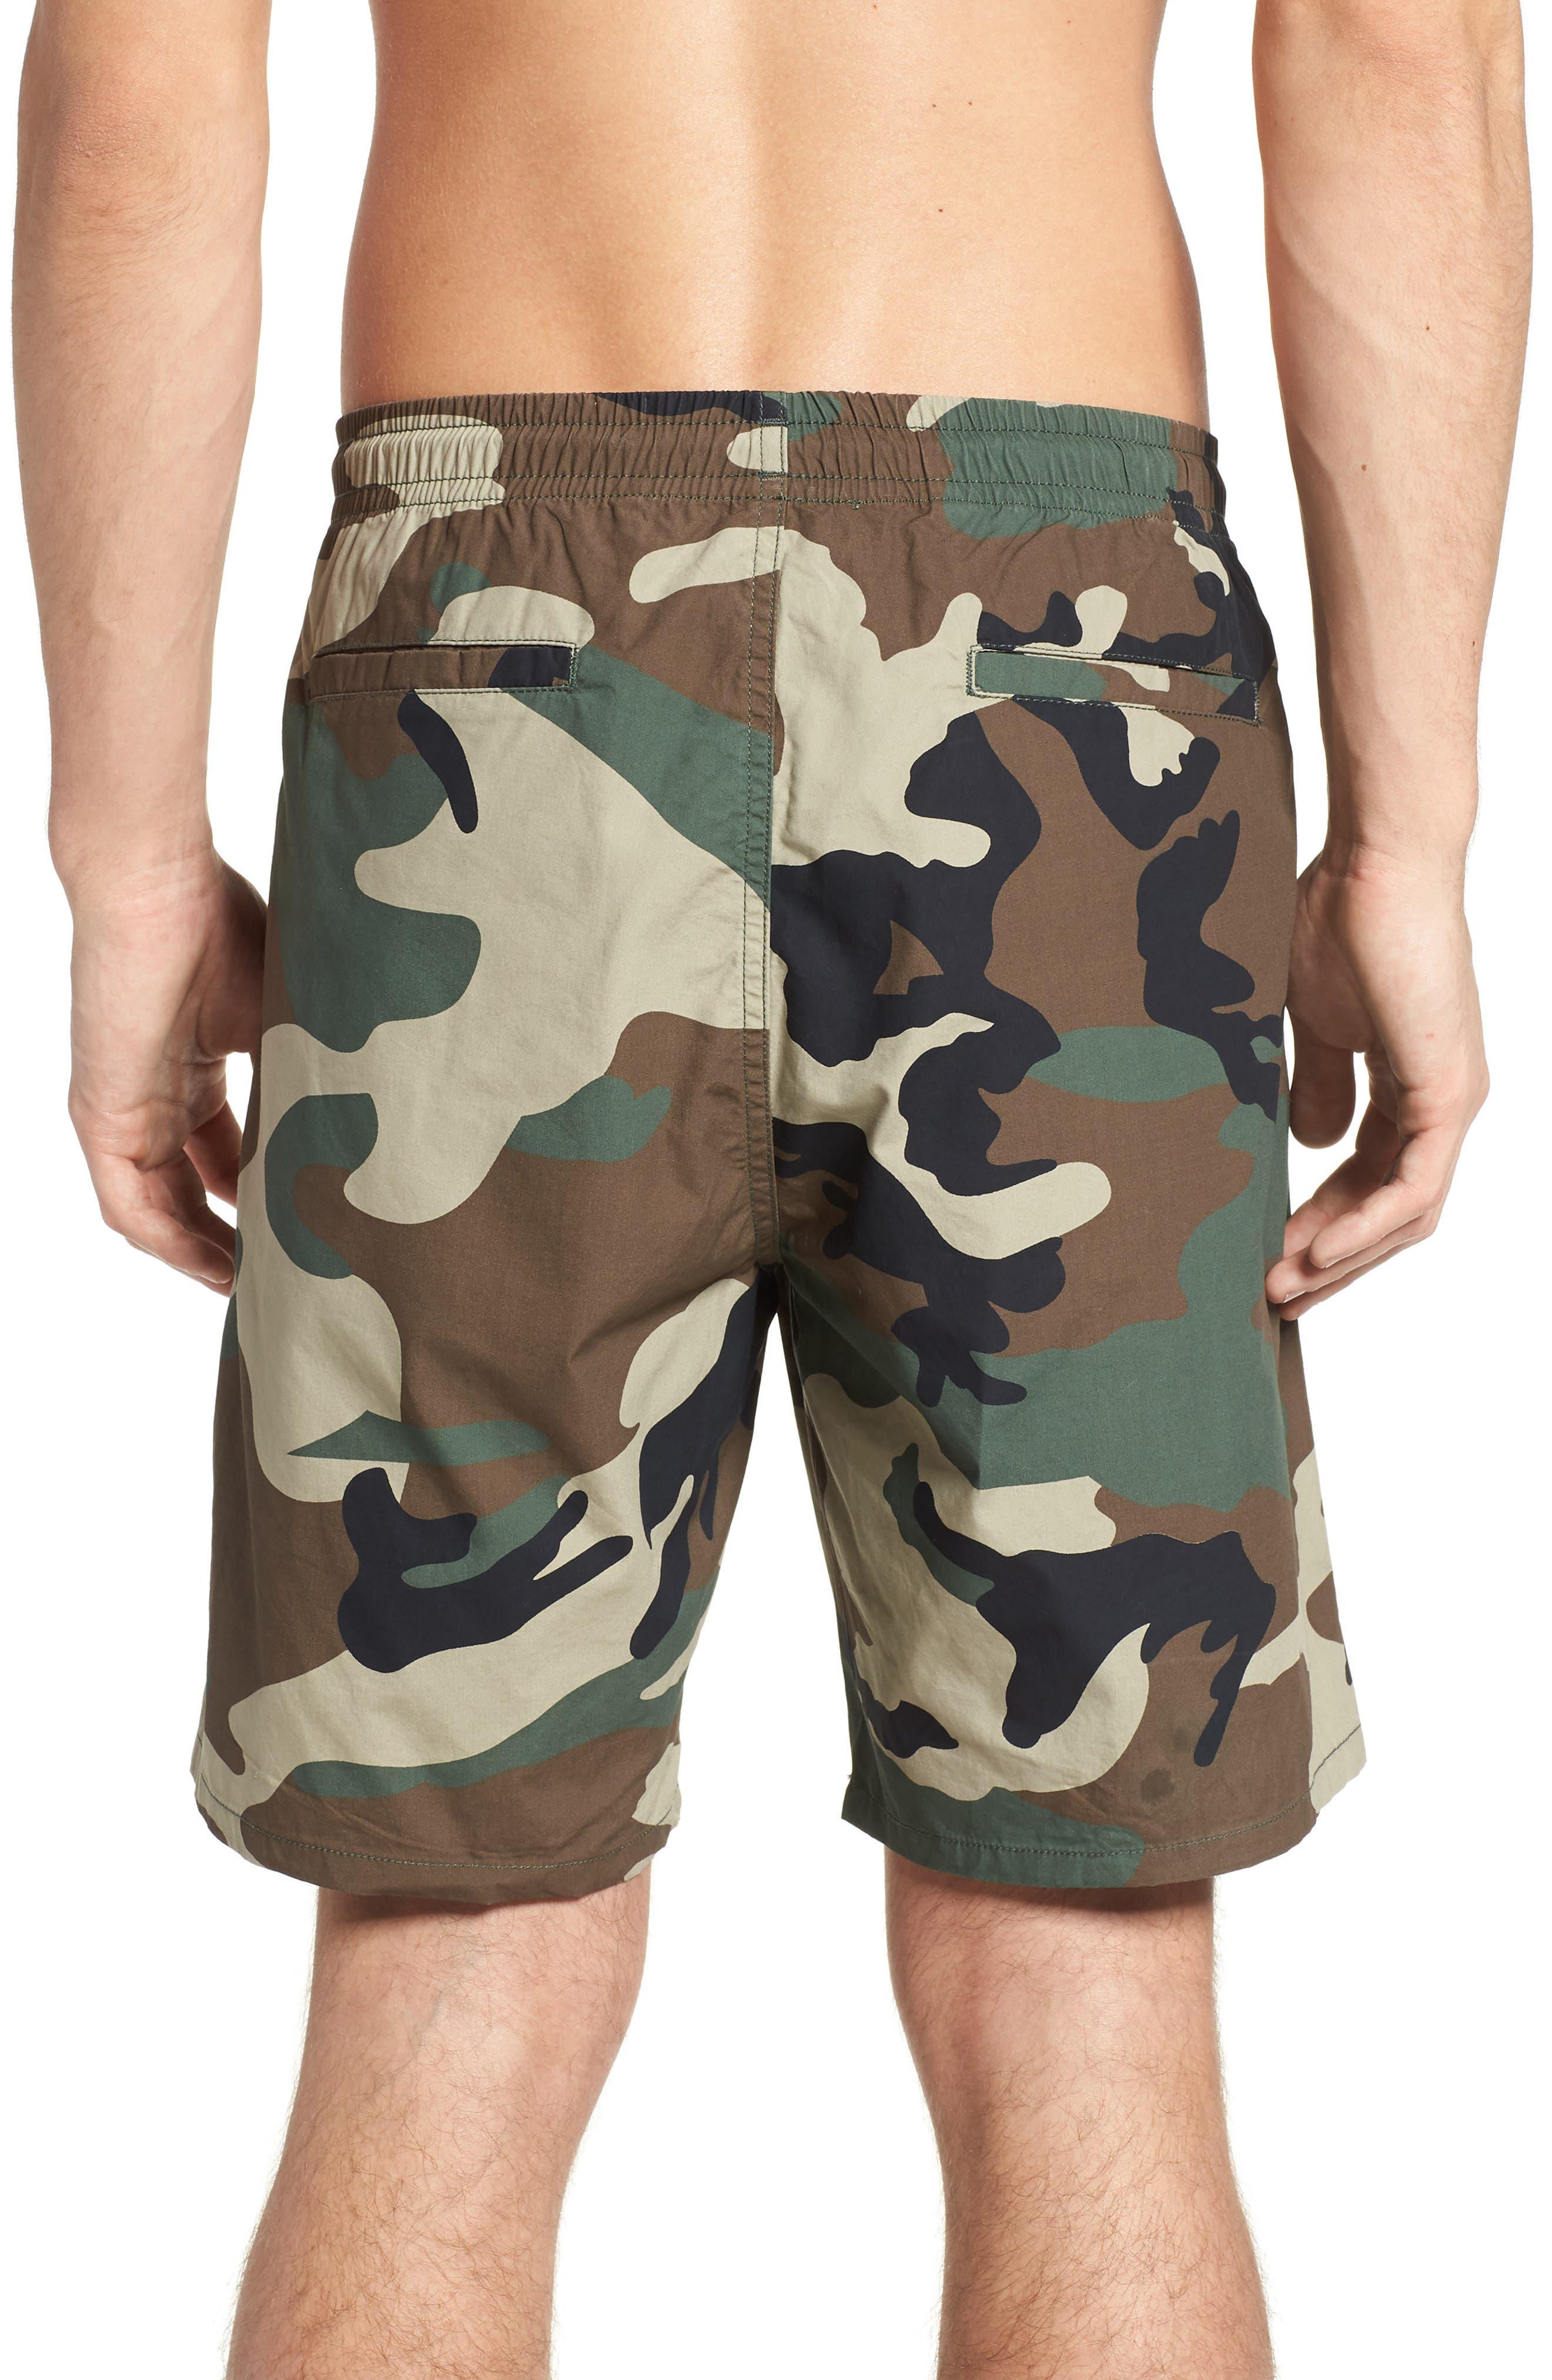 Subversion Shorts,                             Alternate thumbnail 2, color,                             Field Camo